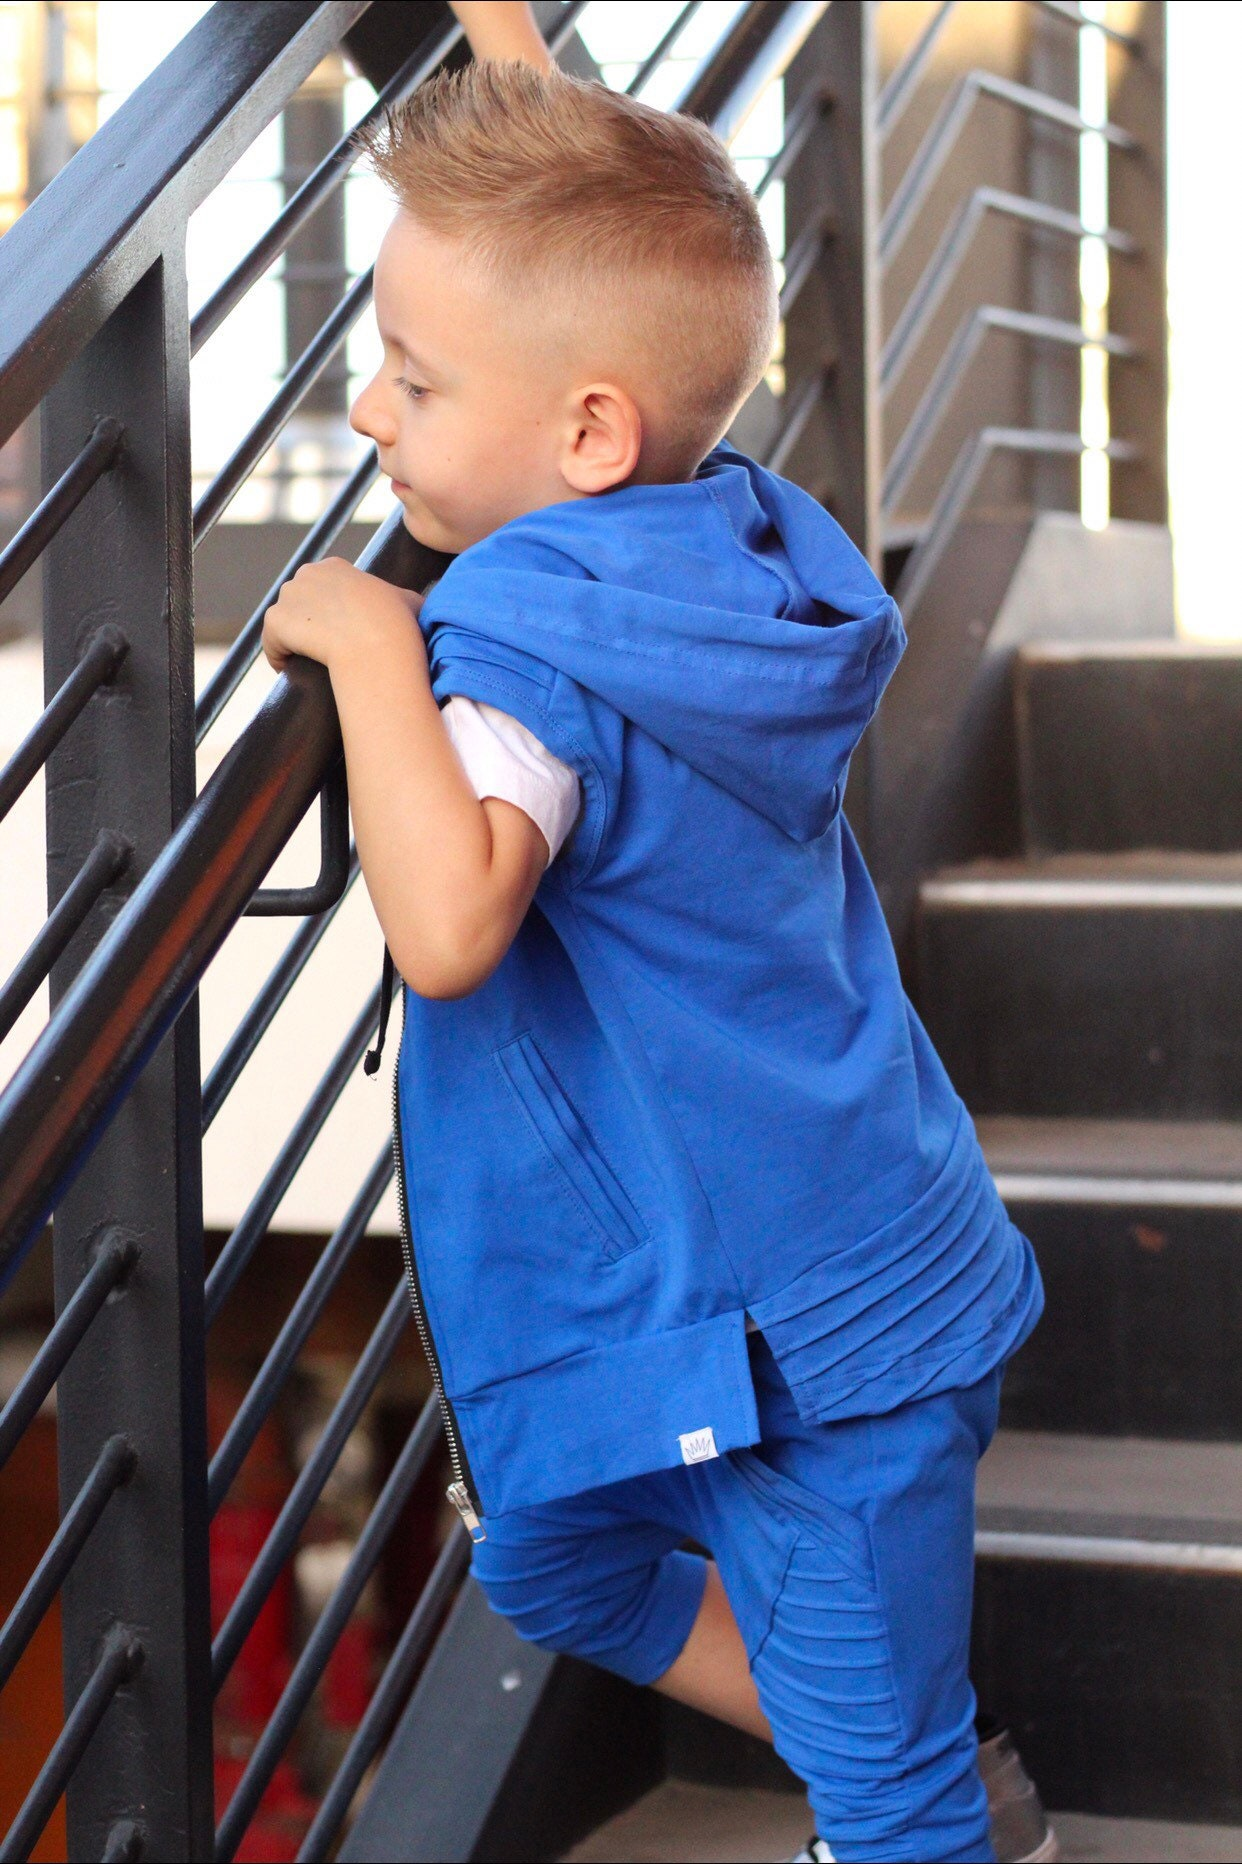 6f3aa1ac92c49 Baby boy shirts / Toddler boy shirts / Baby boy t shirts / Hipster boy  clothes / Toddler boy clothes /Trendy baby boy clothes /Cool baby boy